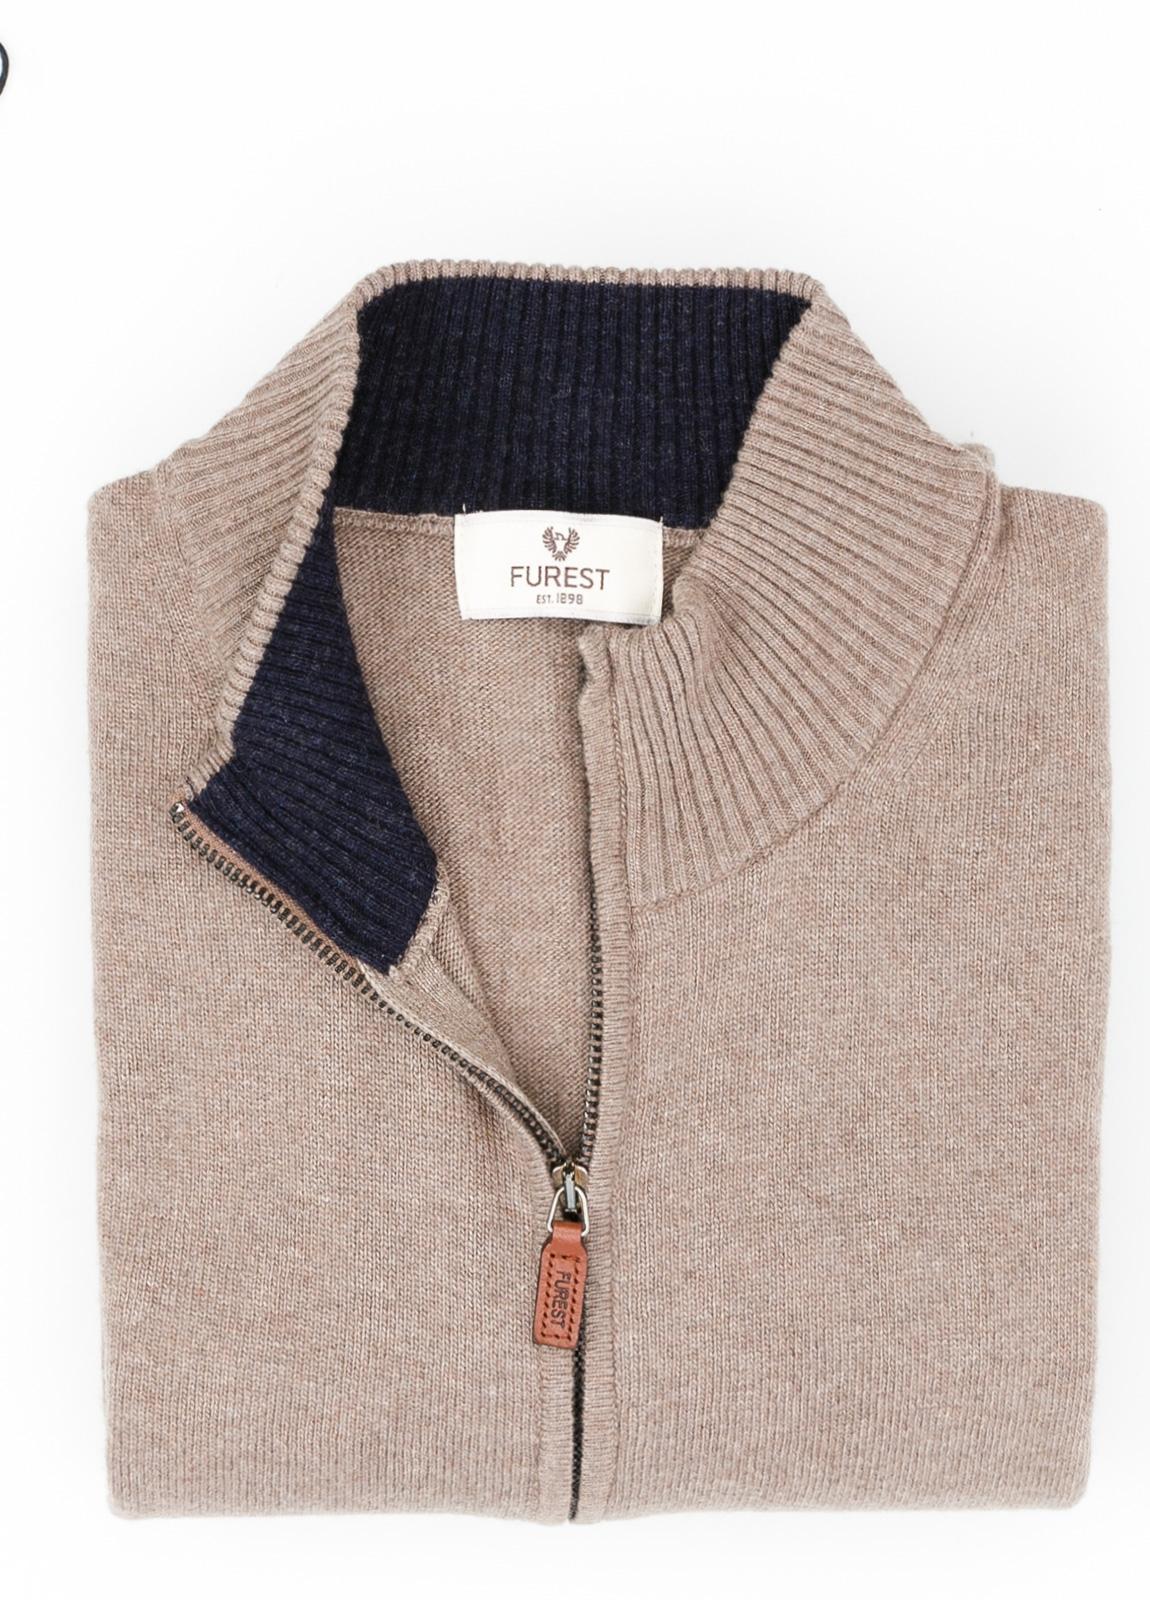 Jersey liso cremallera doble carro, color marrón, 40% lana merino, 30% viscosa, 10% cachemire - Ítem1